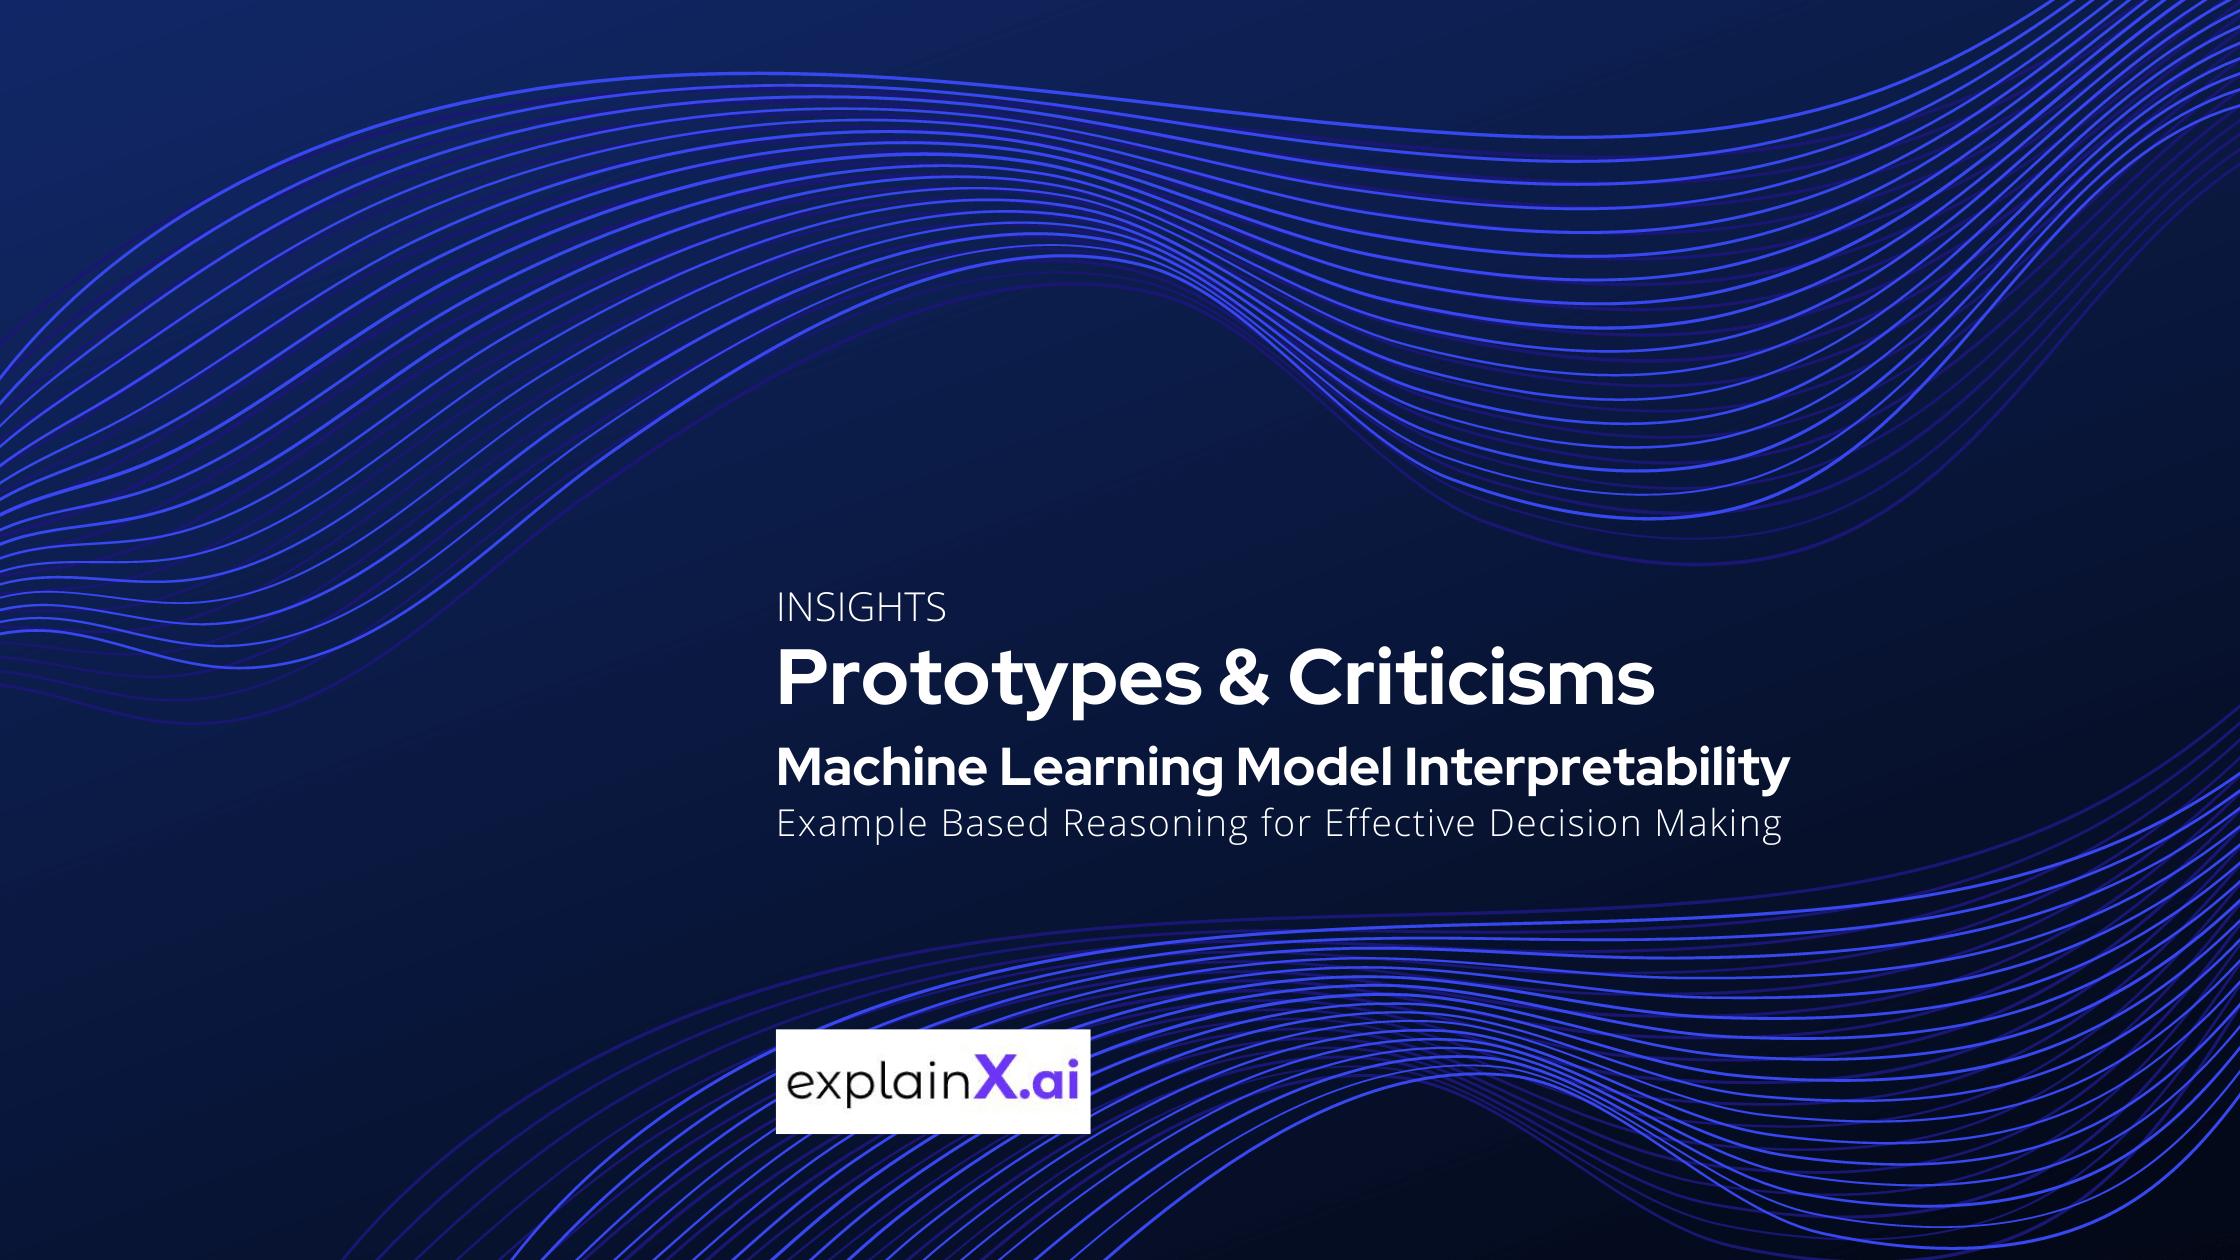 explainX.ai prototypes and criticisms